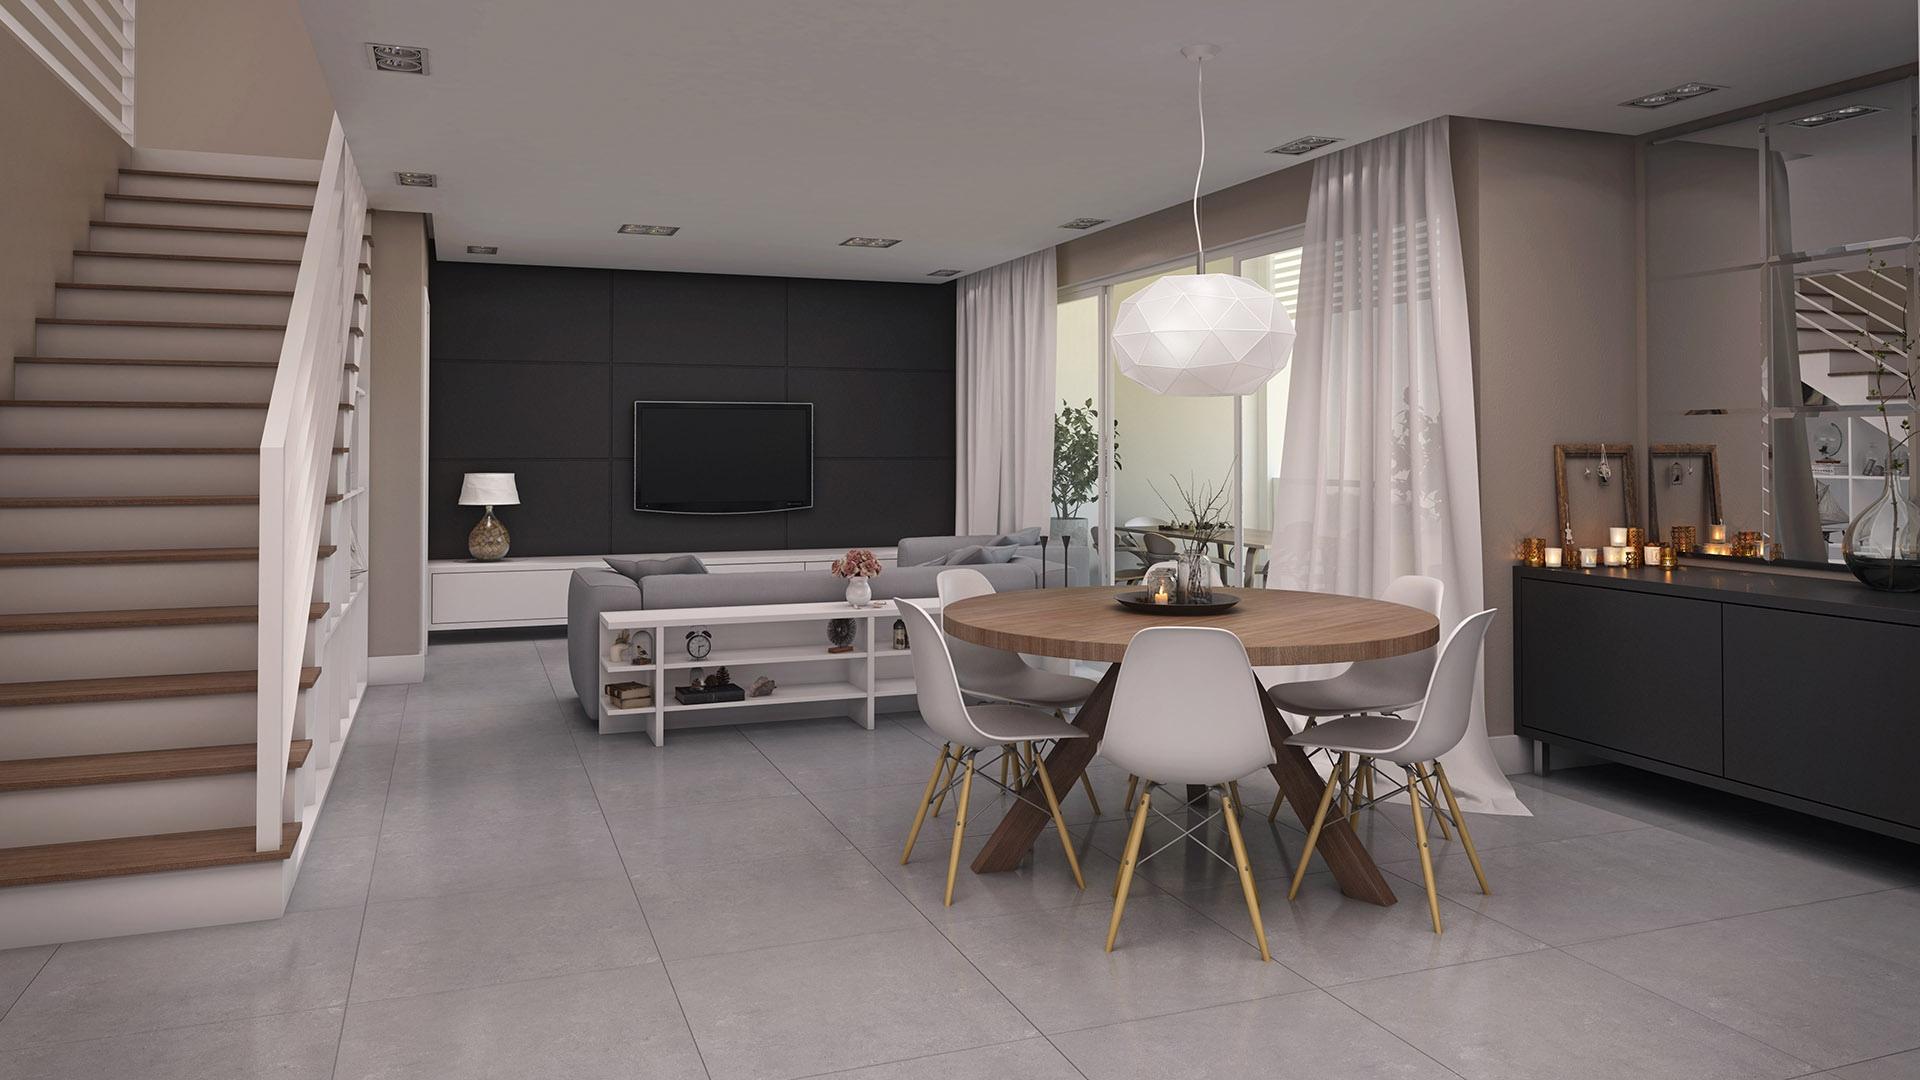 Интерьер дизайнерской квартиры-студии от Felipe Broering